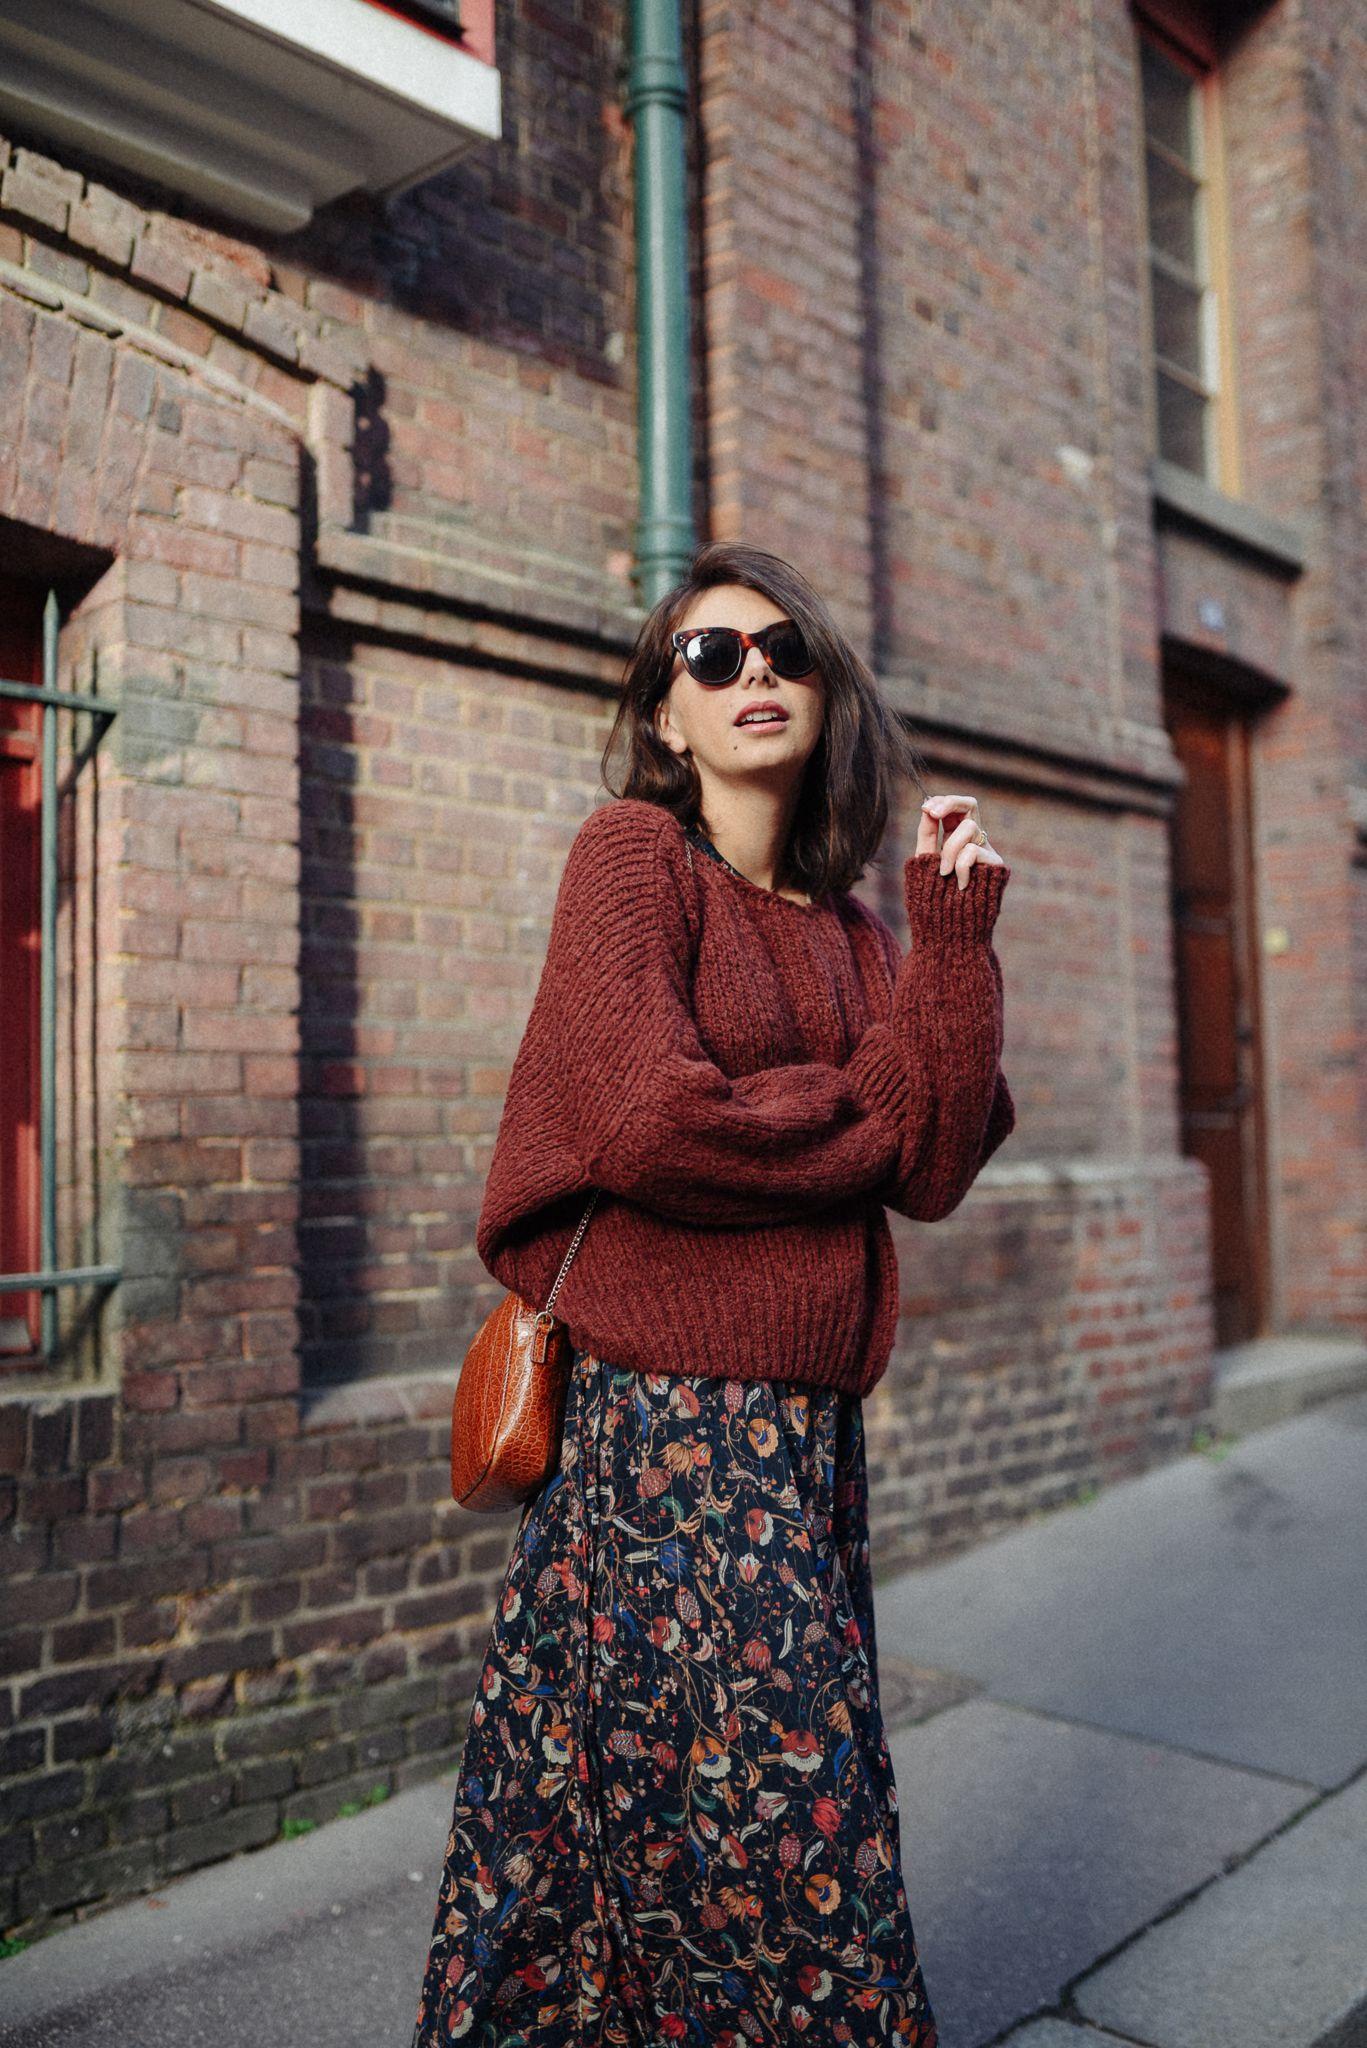 73fd3041dfd9 Passion gros pull + jupe ou robe en hiver   S habiller cet automne ...